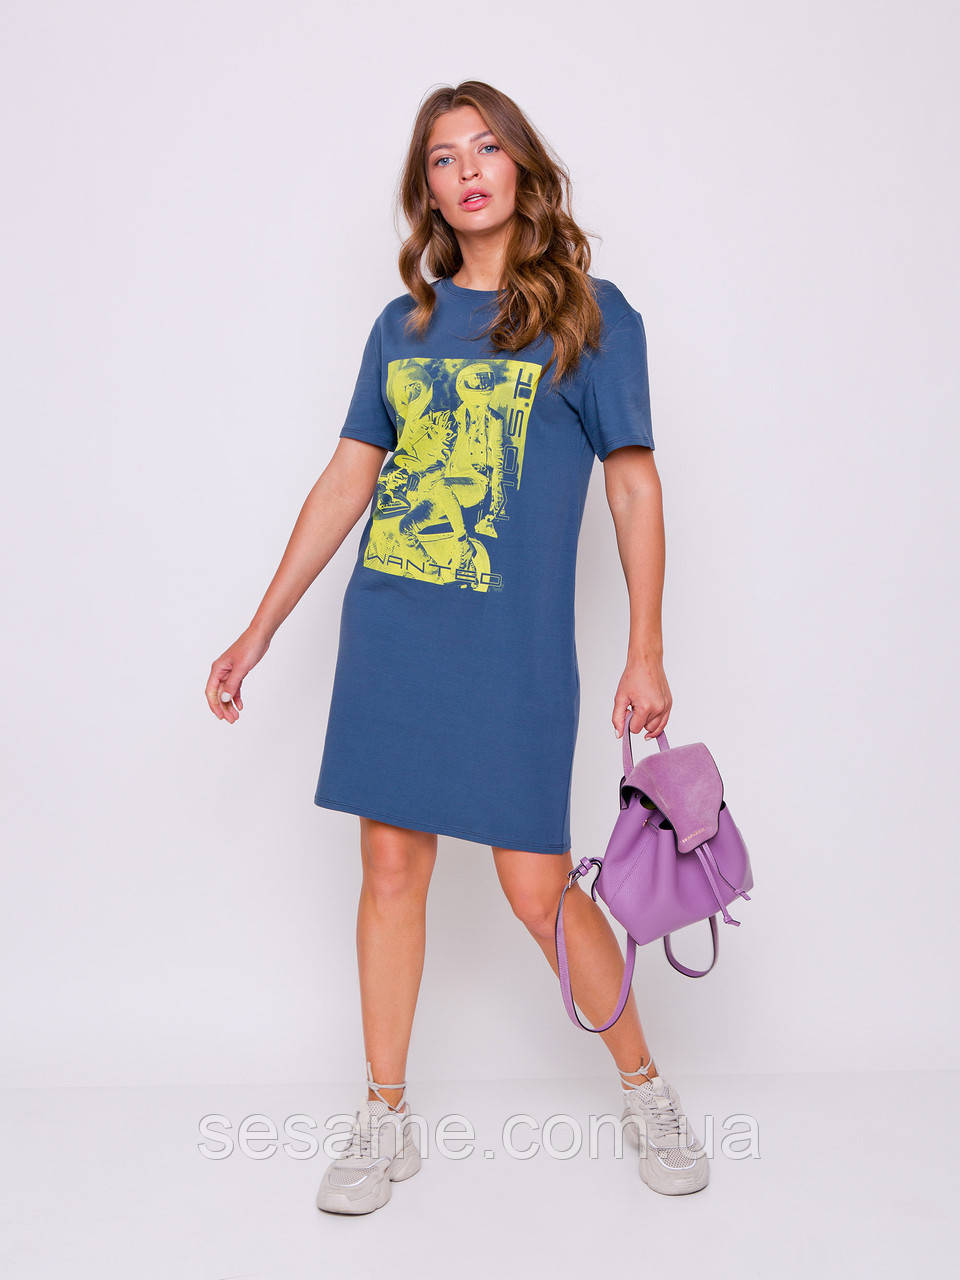 grand ua Тамани платье-футболка